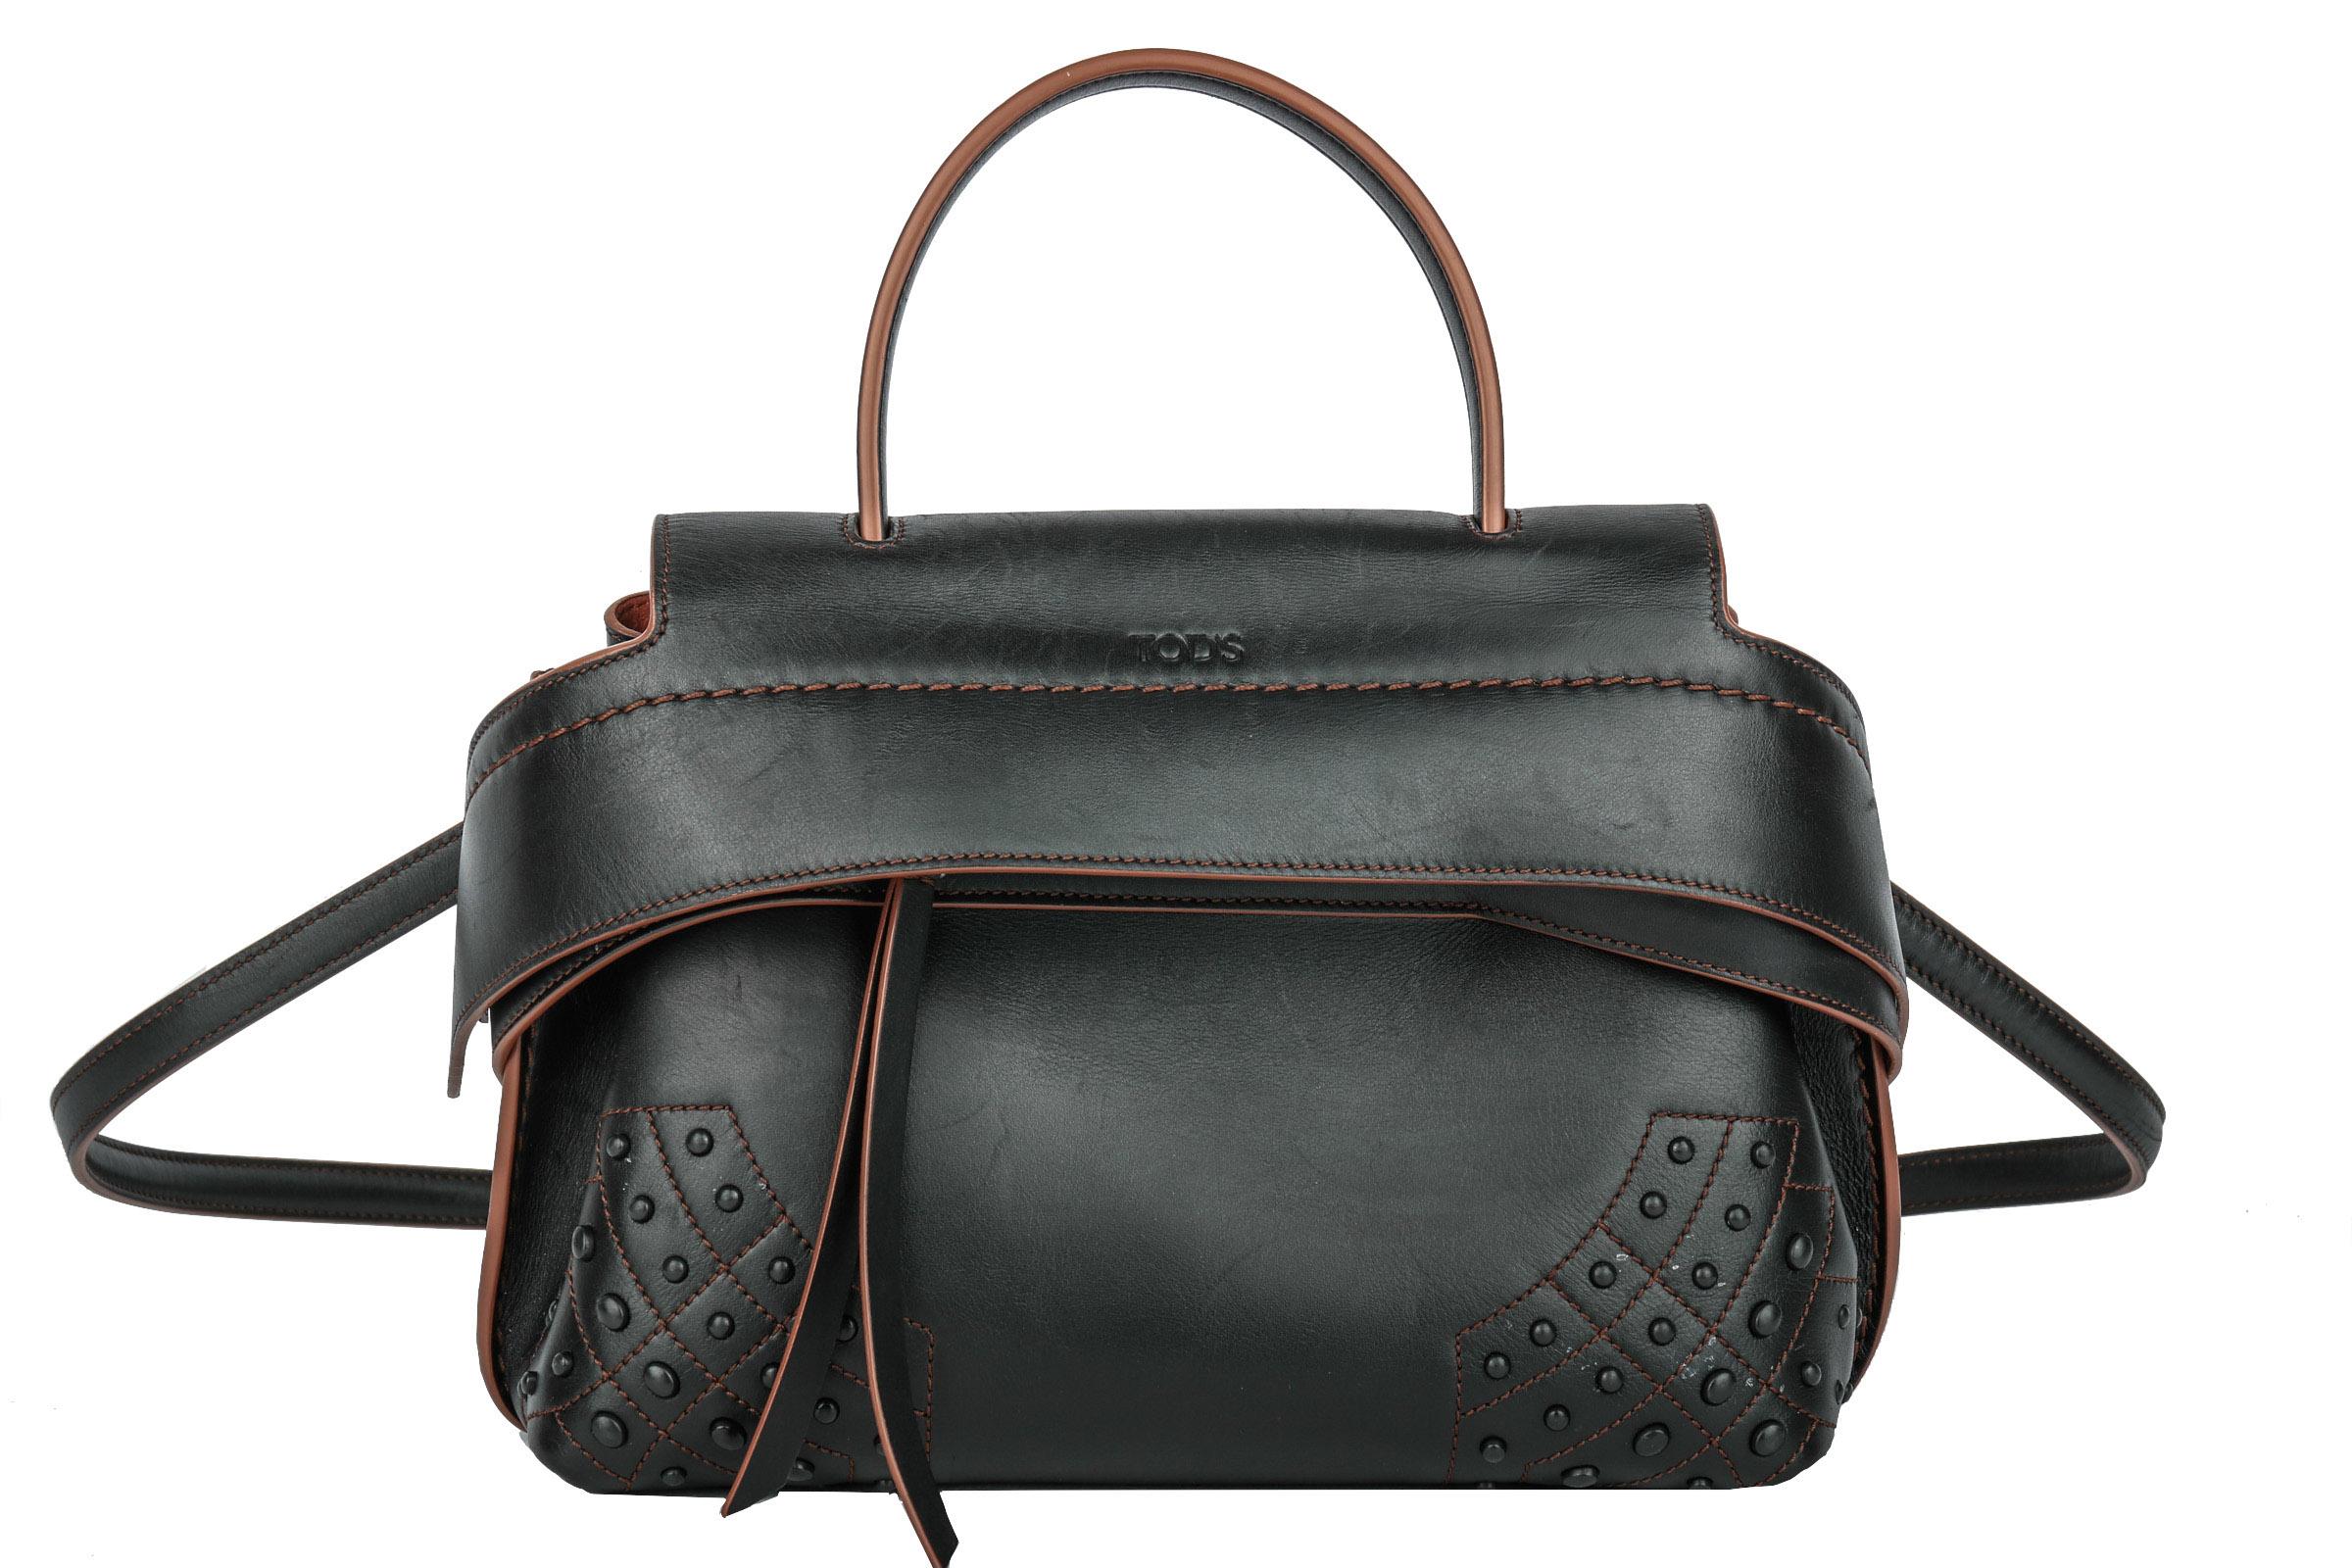 4c161a6d31af4 Tod s Handtaschen   Accessoires